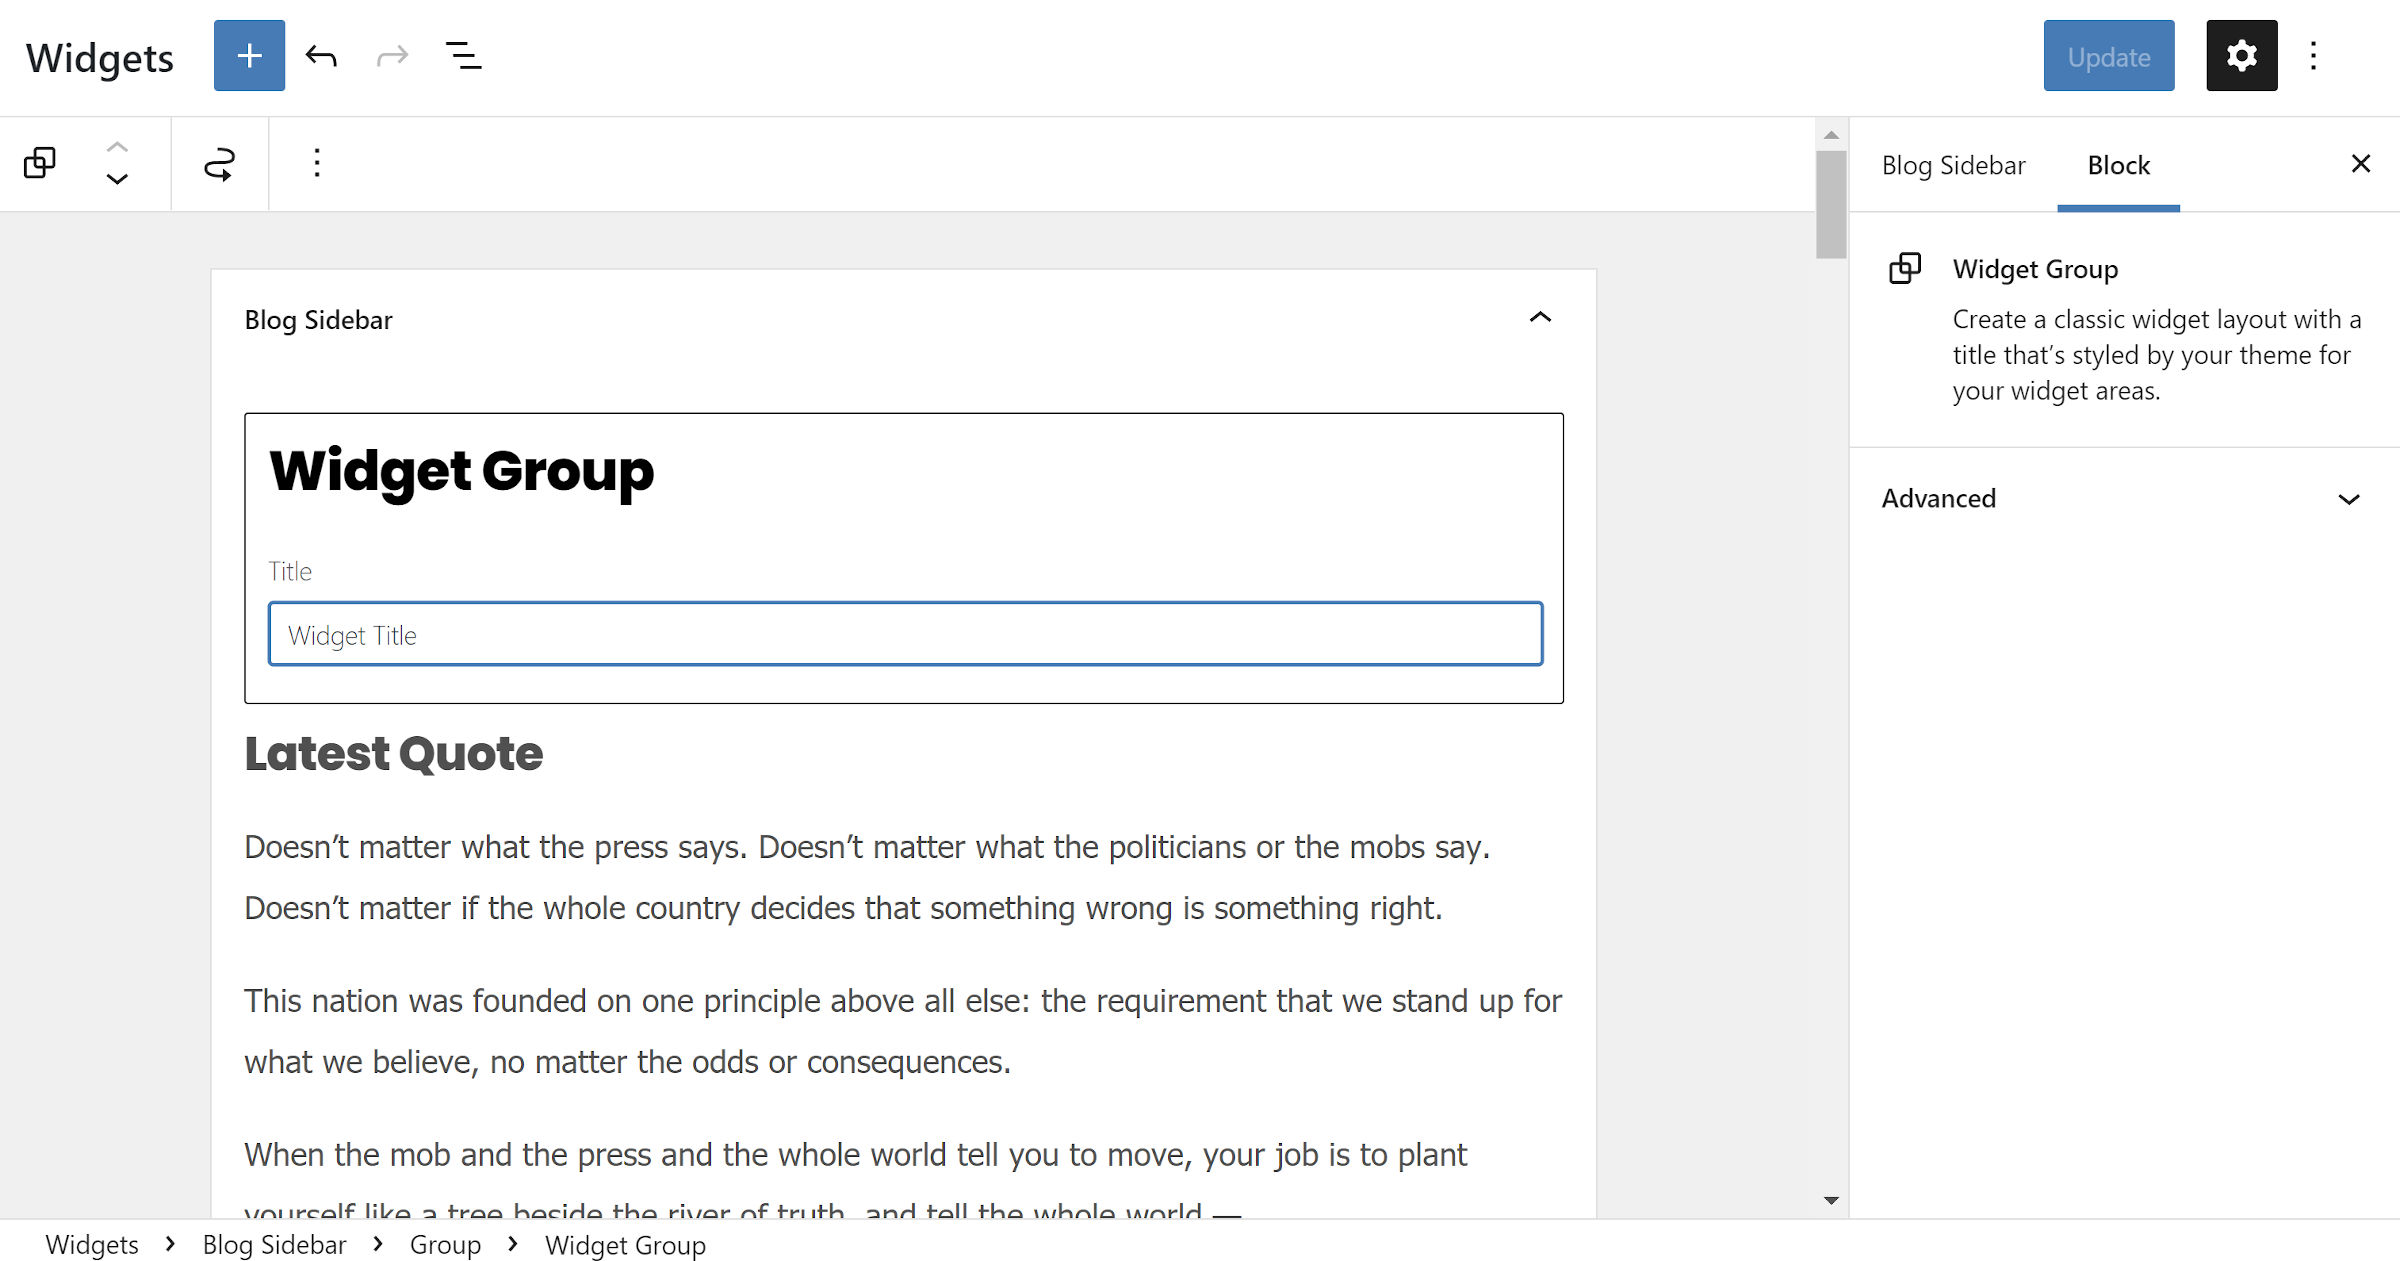 Widgets screen in the WordPress admin with the new Widget Group block shown.